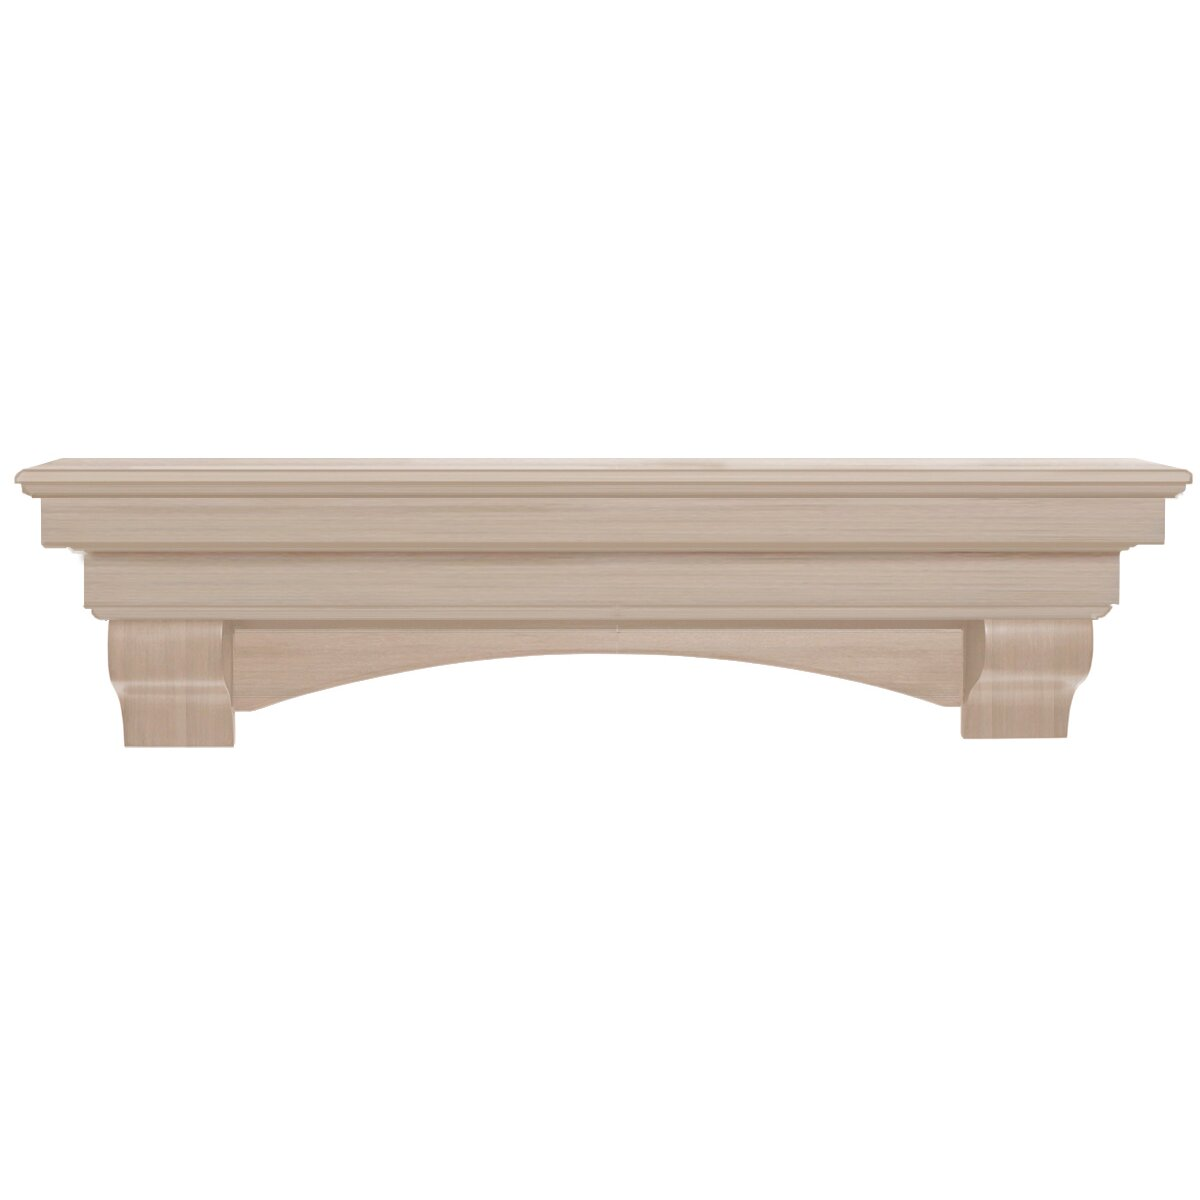 Pearl Mantels Auburn Fireplace Mantel Shelf - Pearl Mantels Auburn Fireplace Mantel Shelf & Reviews Wayfair